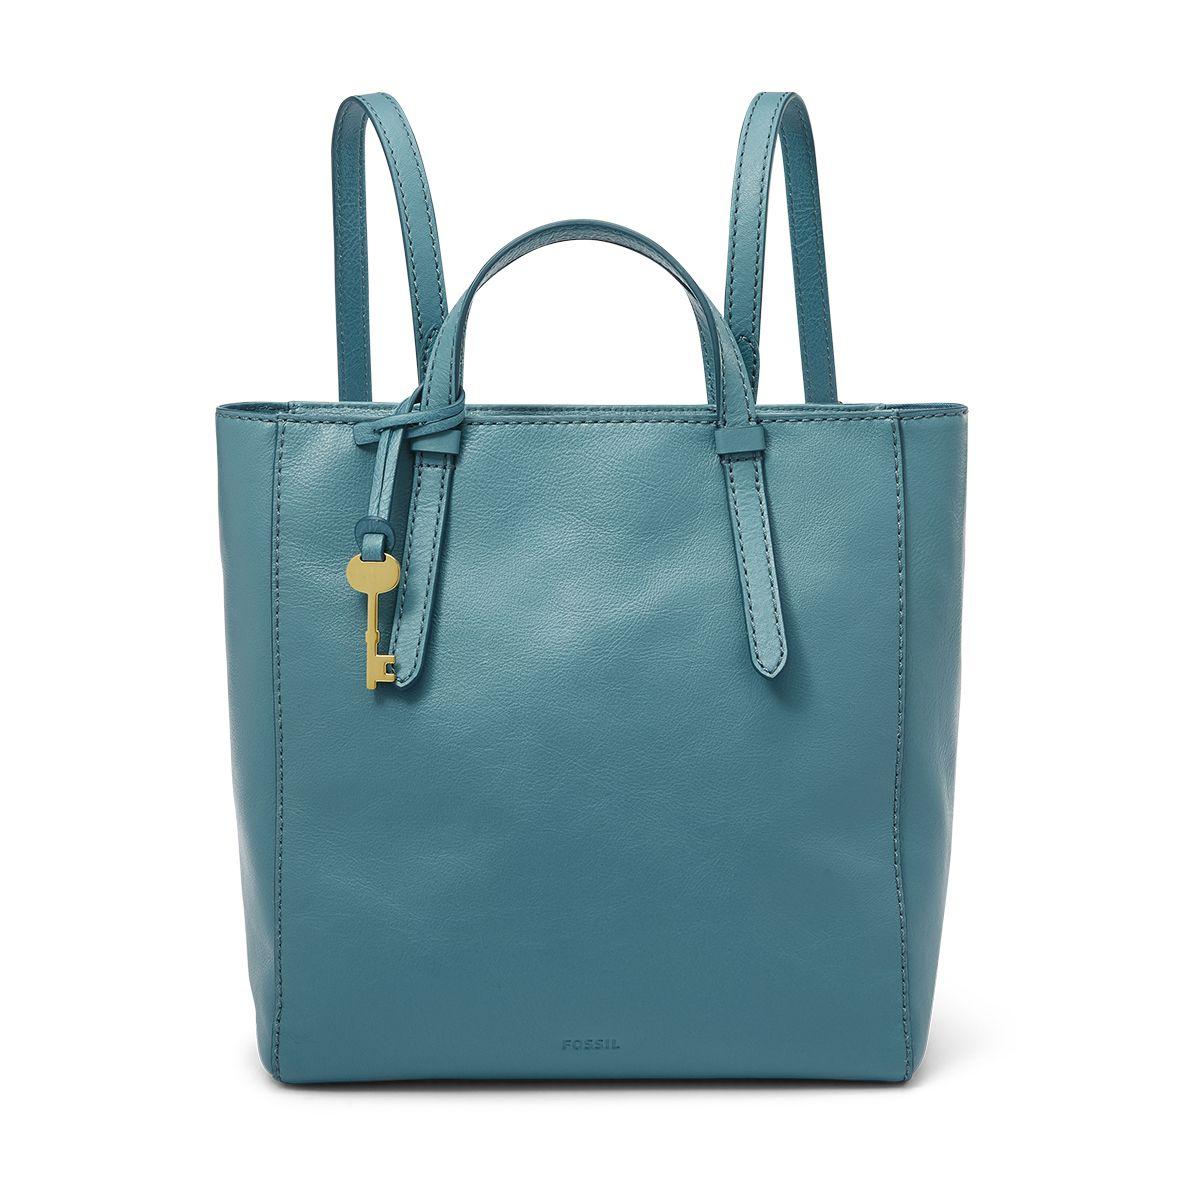 12f449f680c1 Fossil Handbags   Purses - Macy s